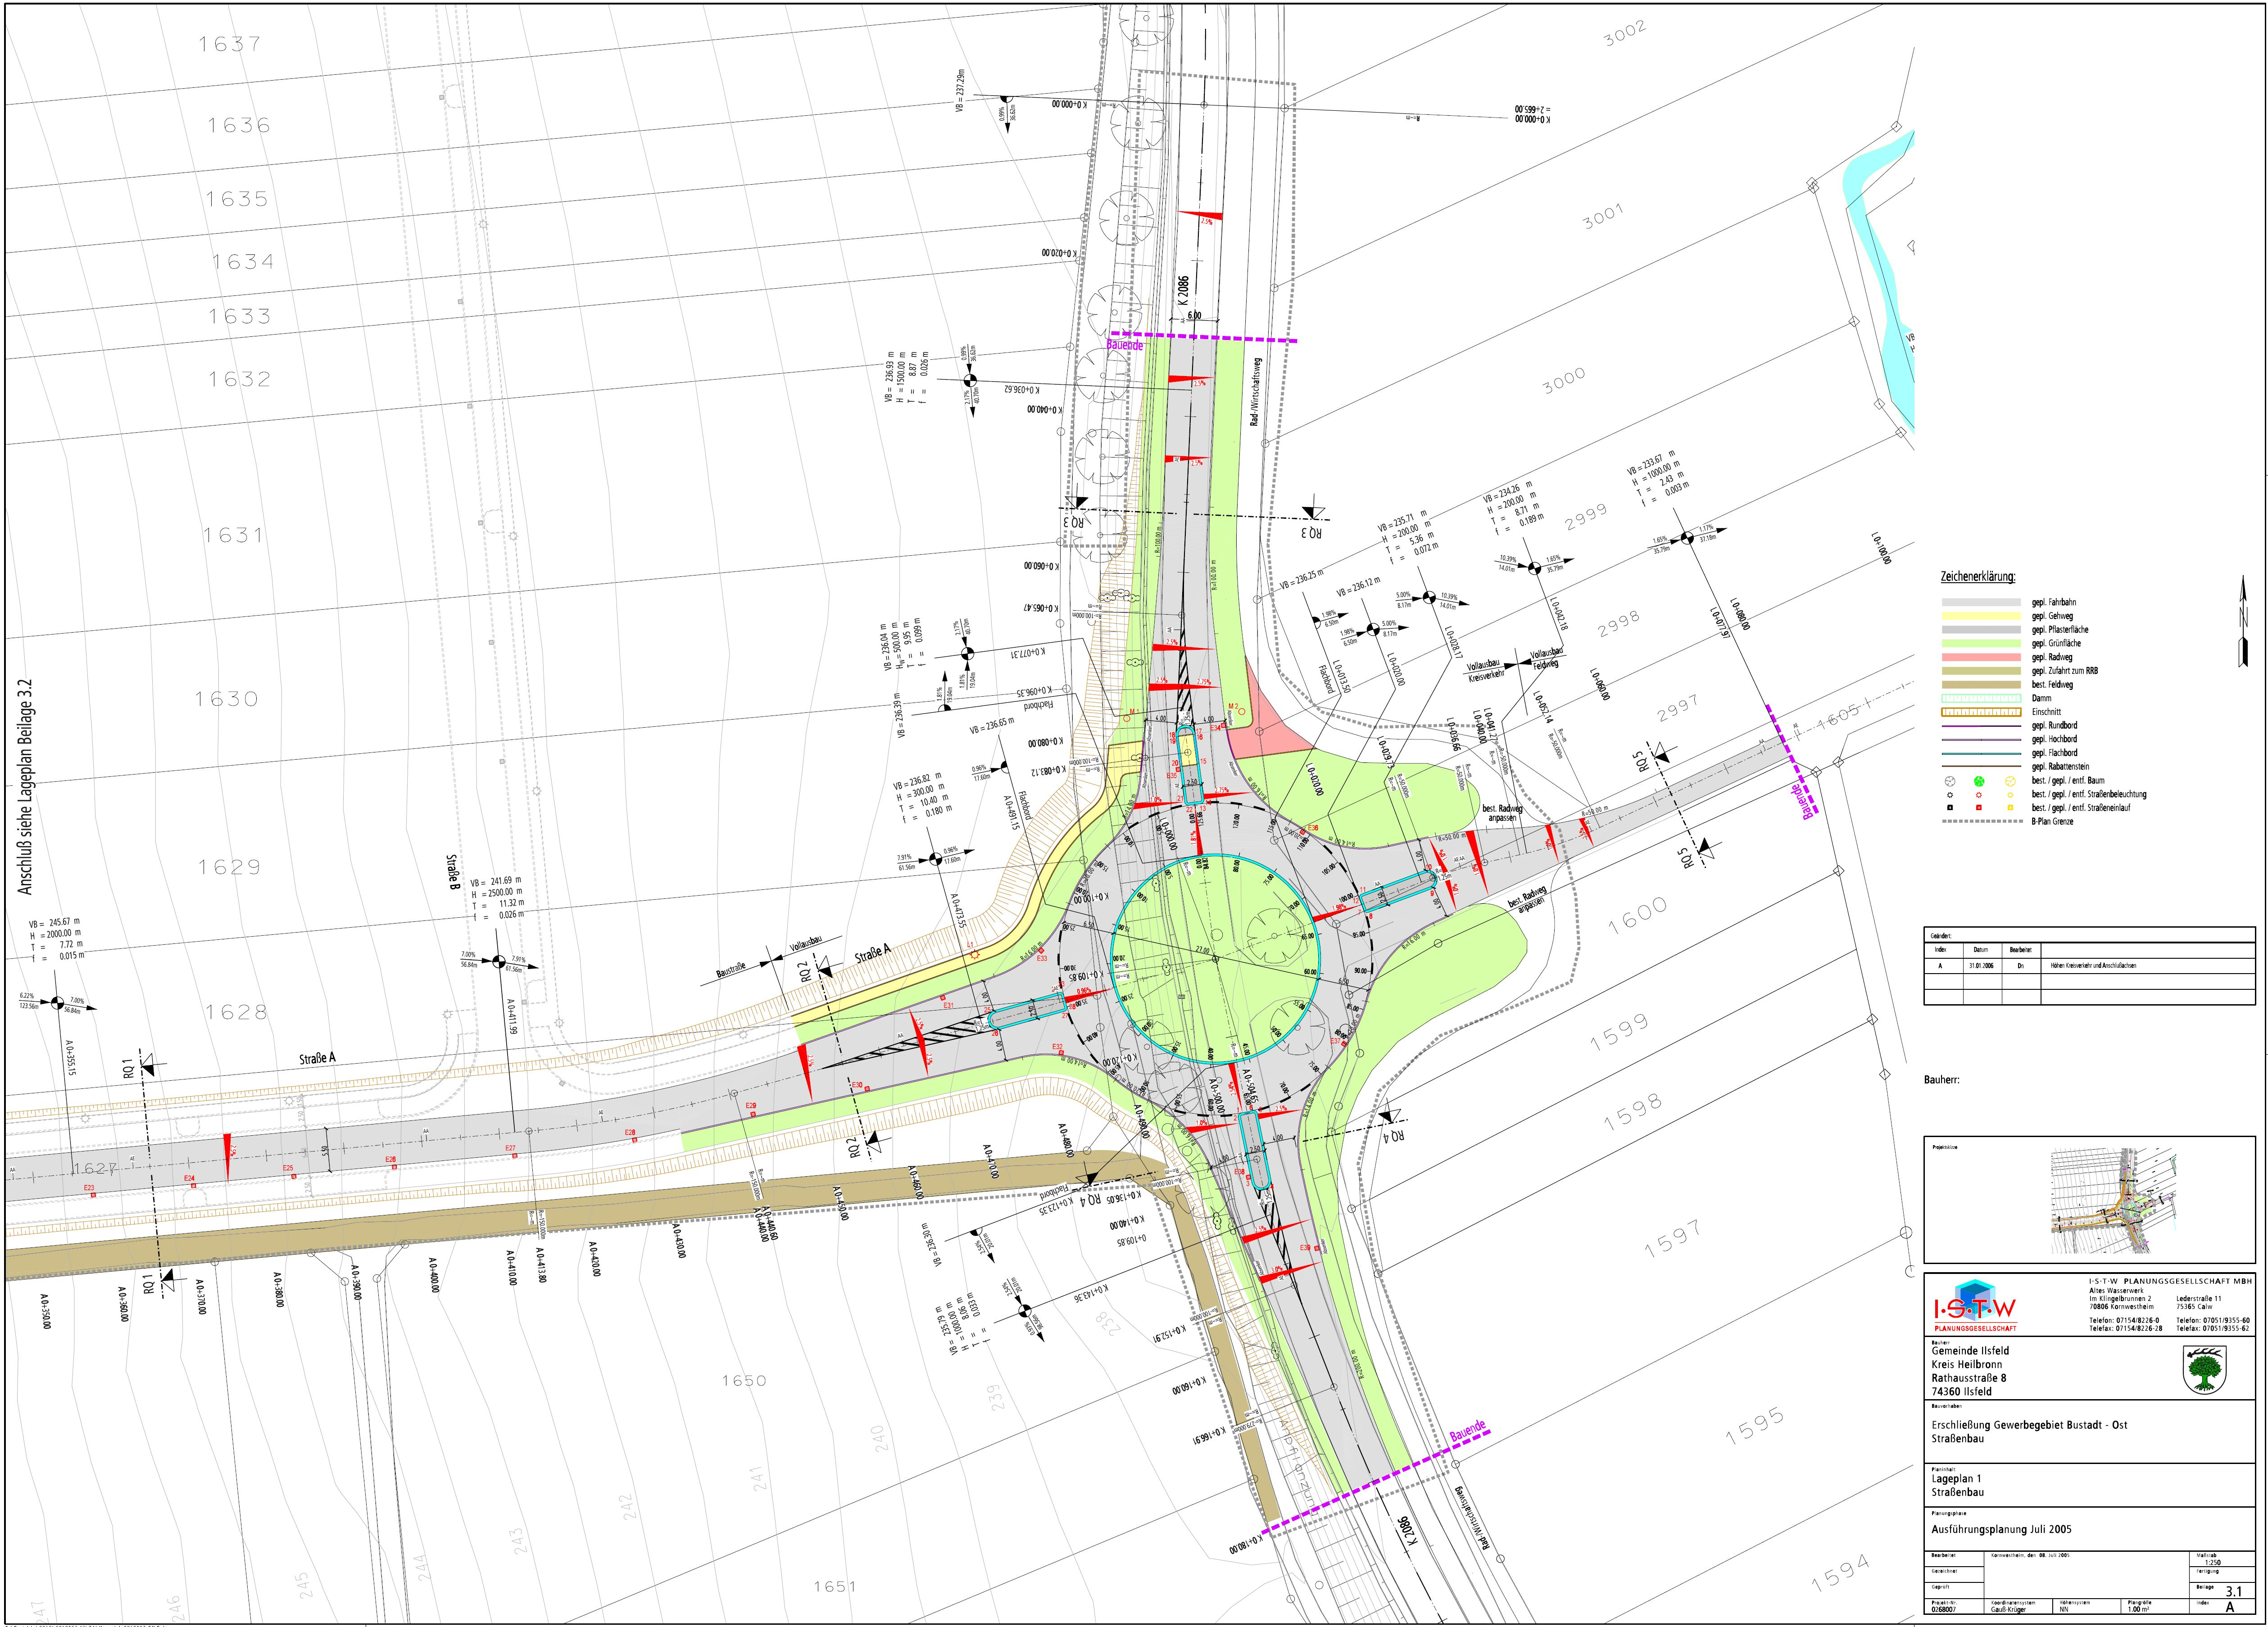 Großartig 98 Stadtplan Galerie - Elektrische Schaltplan-Ideen ...